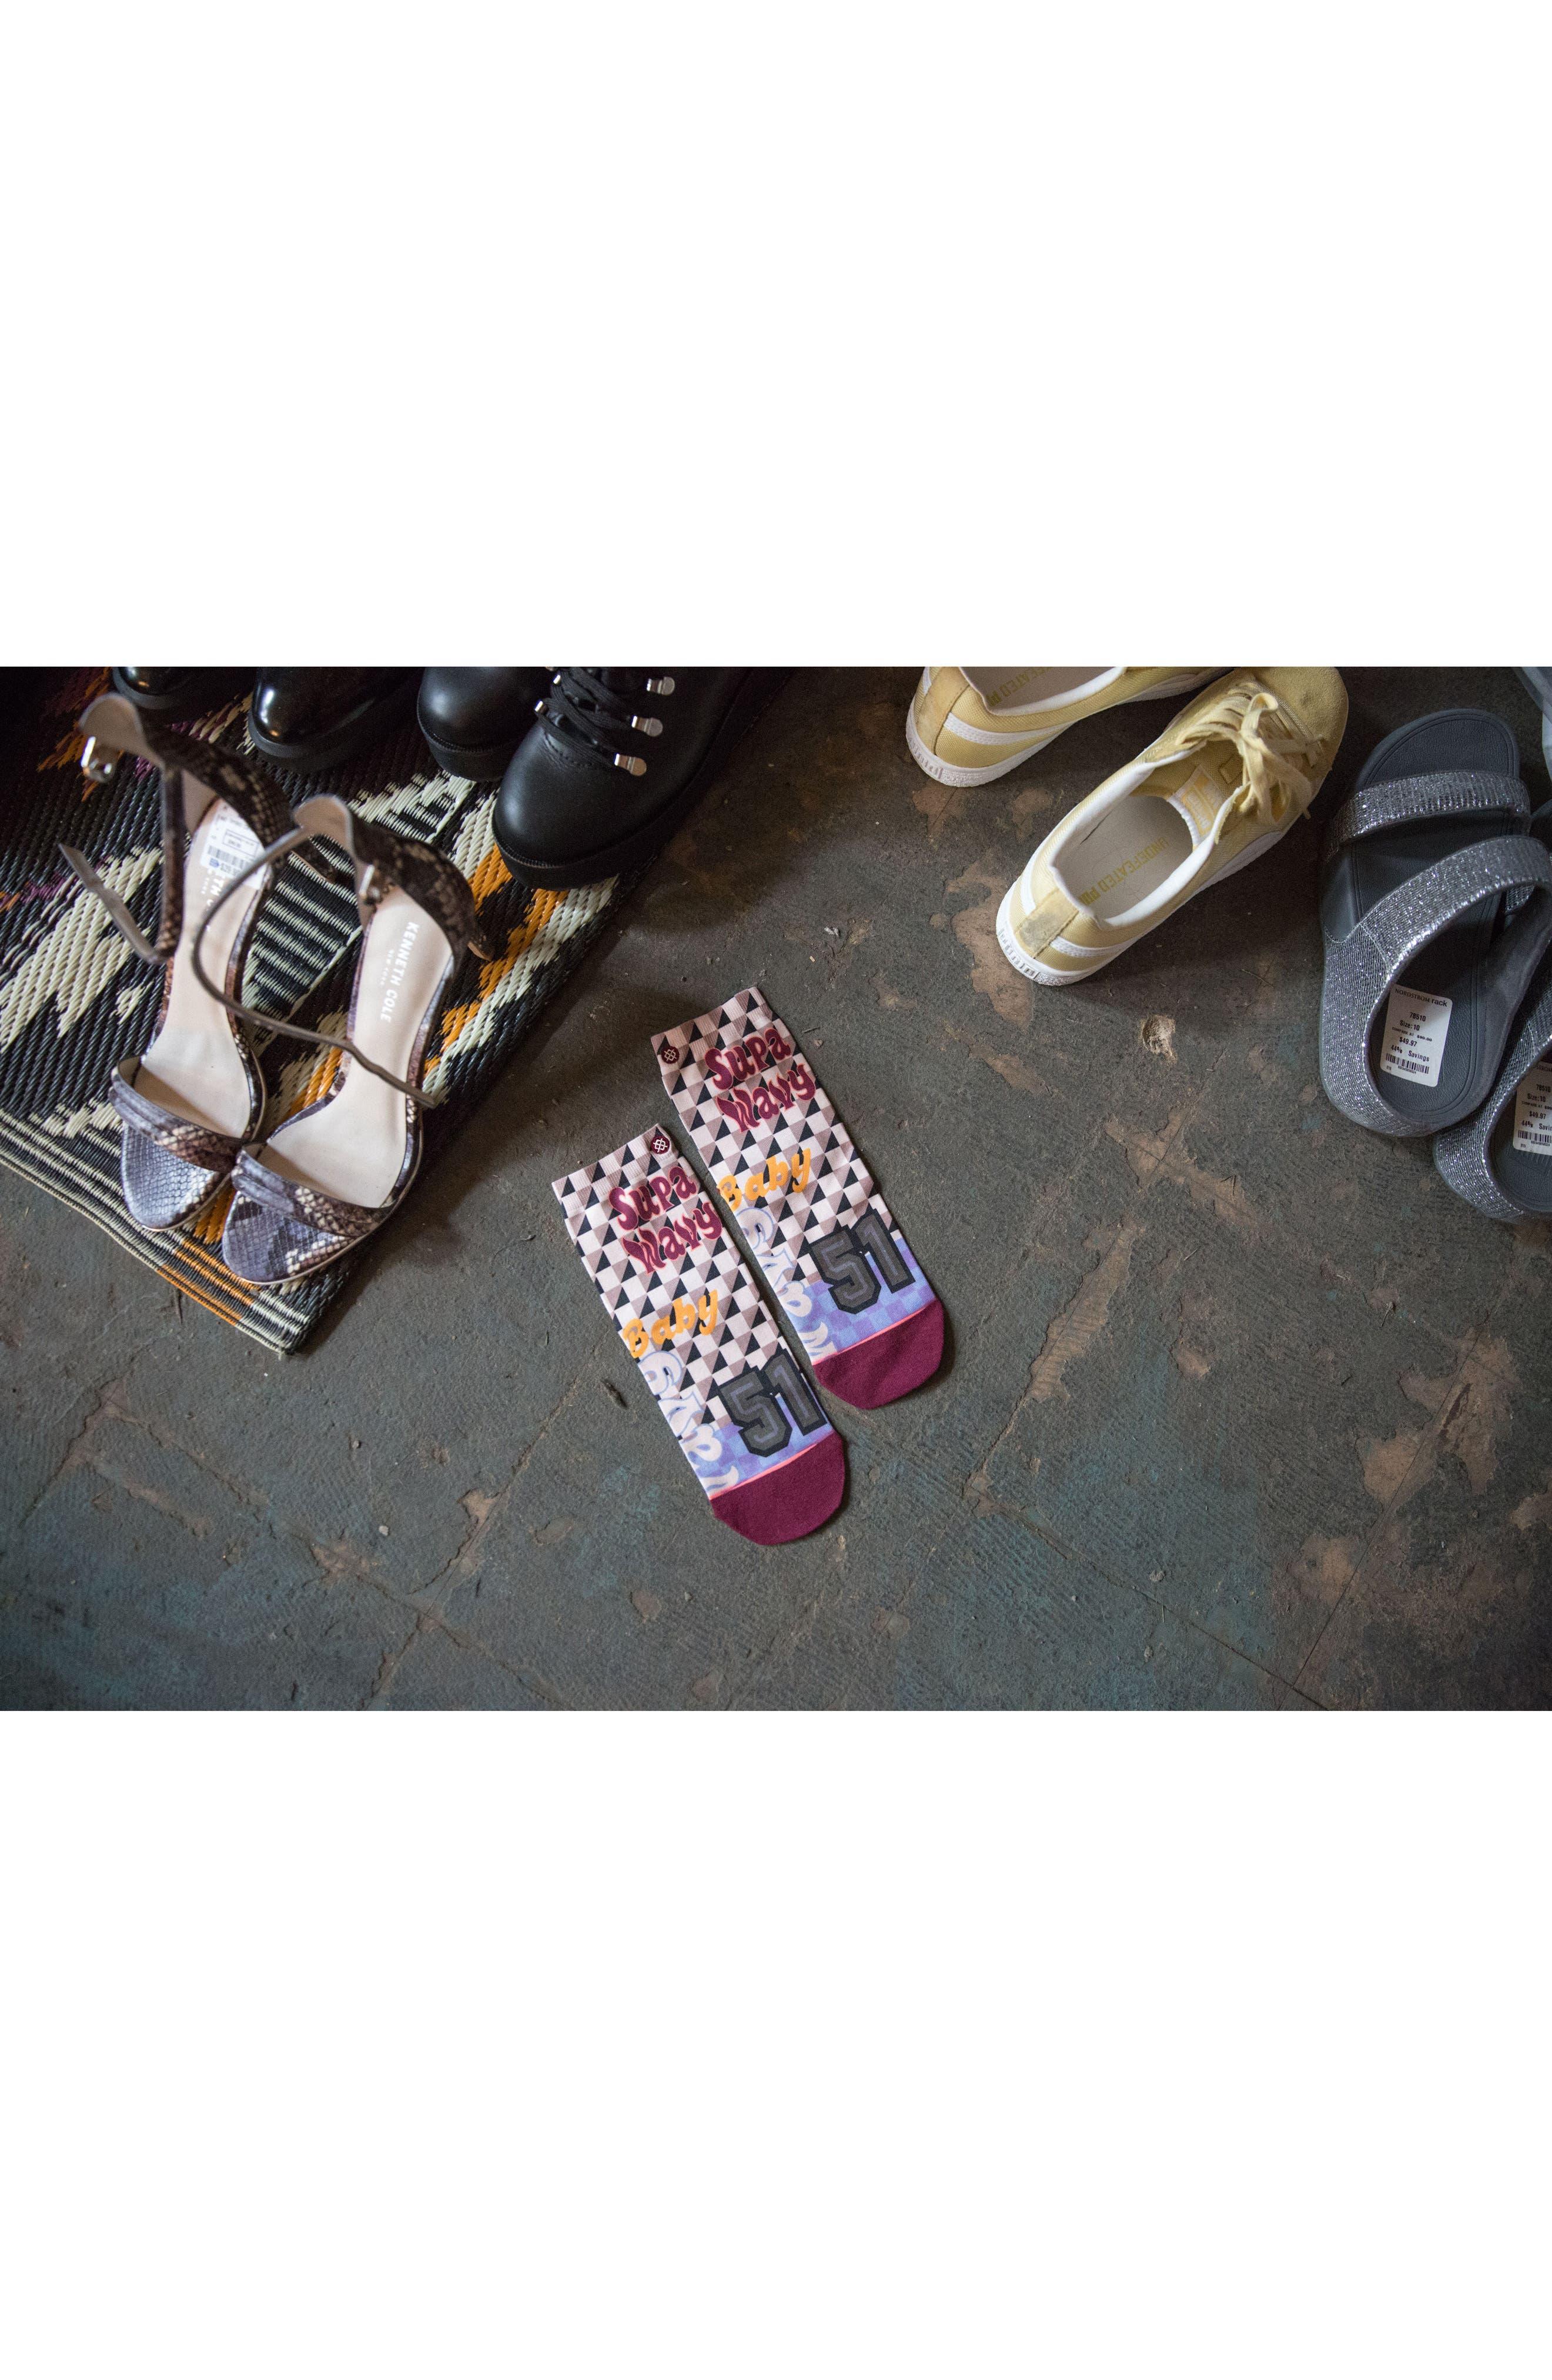 Lowrider Supa Wavy Socks,                             Alternate thumbnail 4, color,                             White Multi